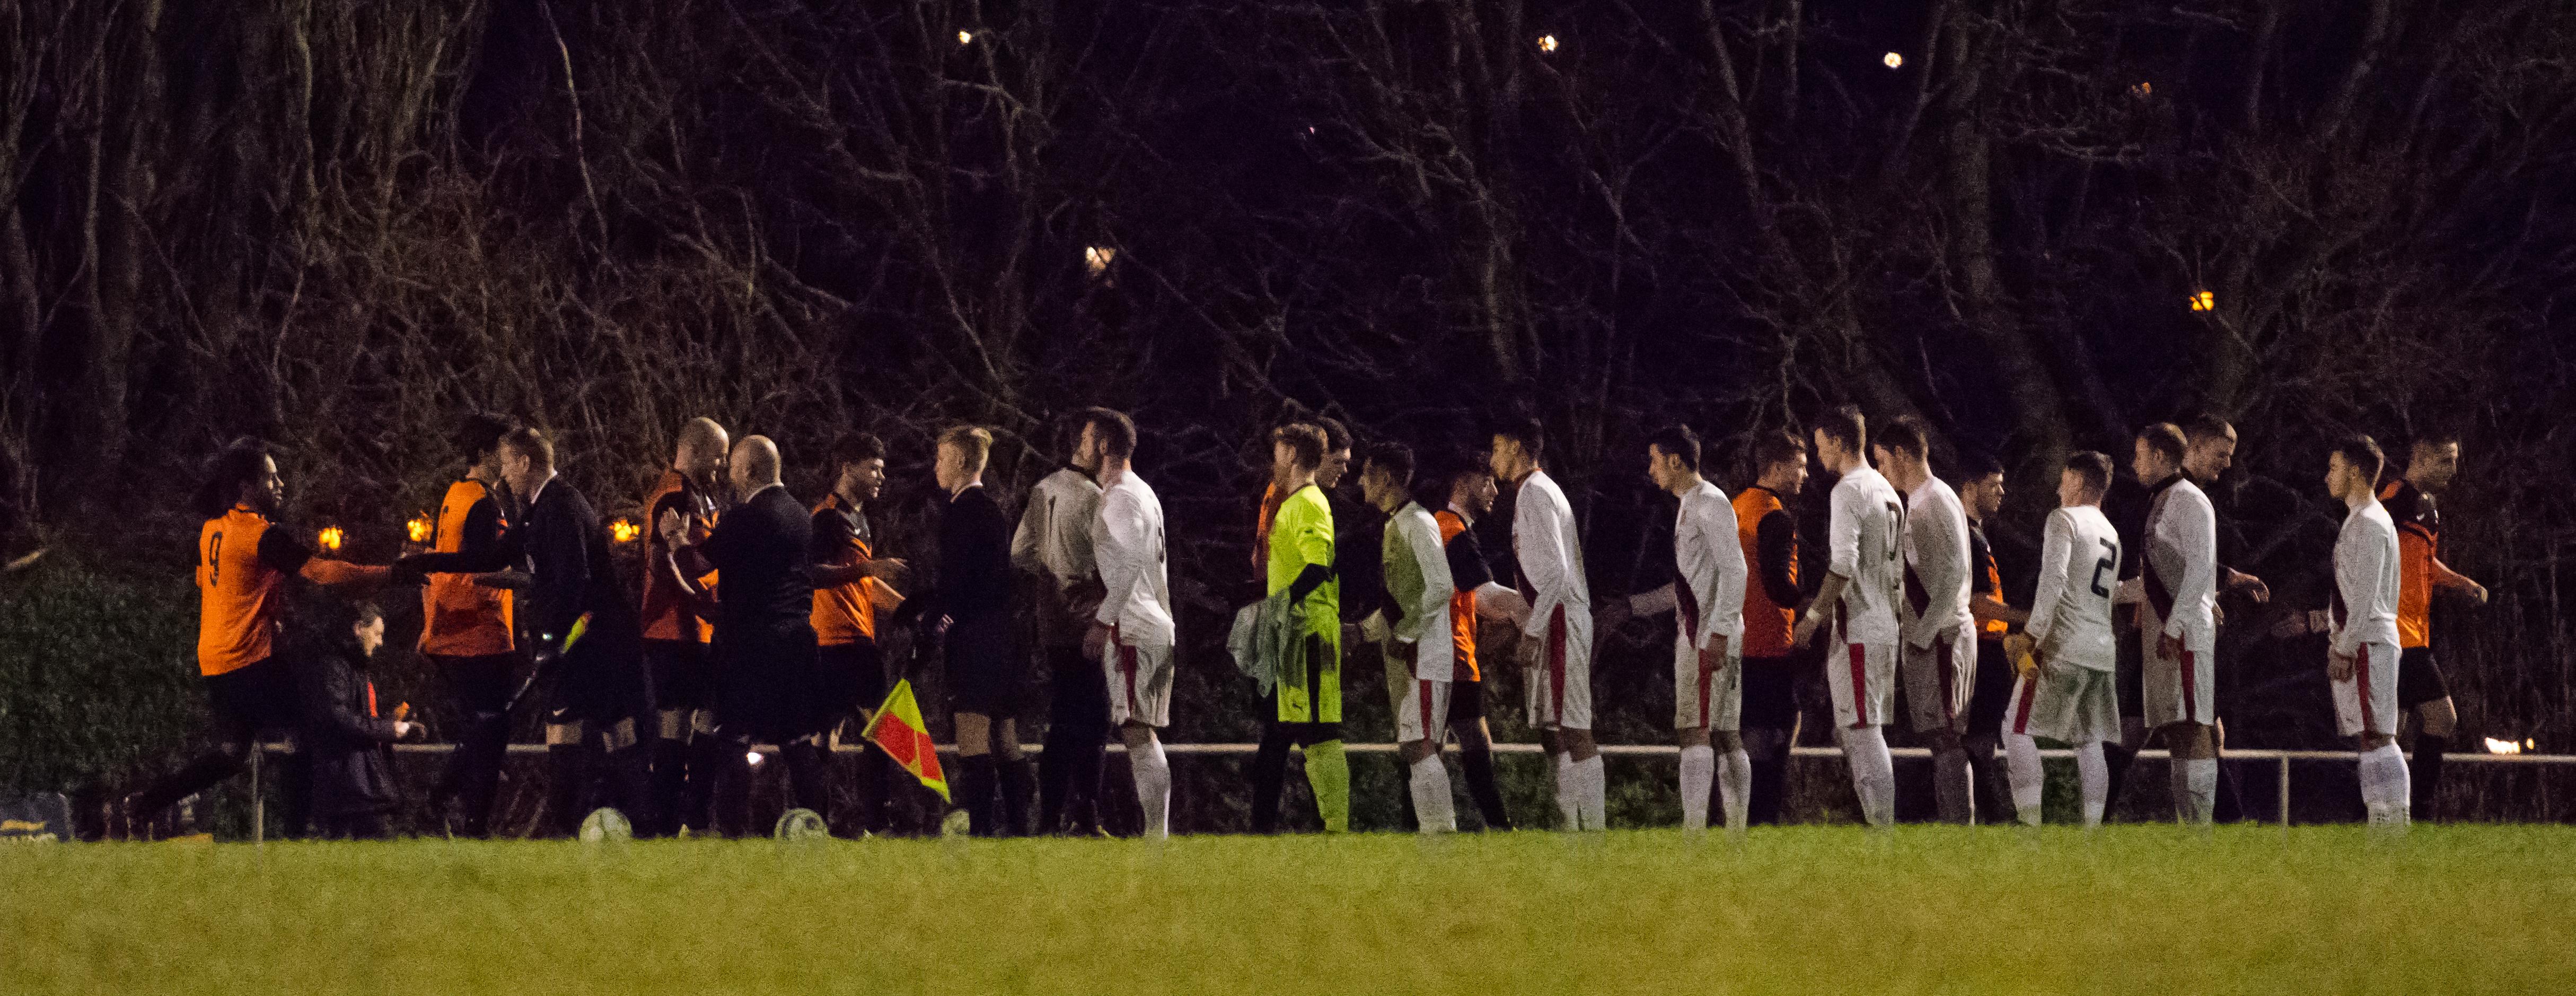 Mile Oak U21s vs Southwick FC U21s 14.12.17 01